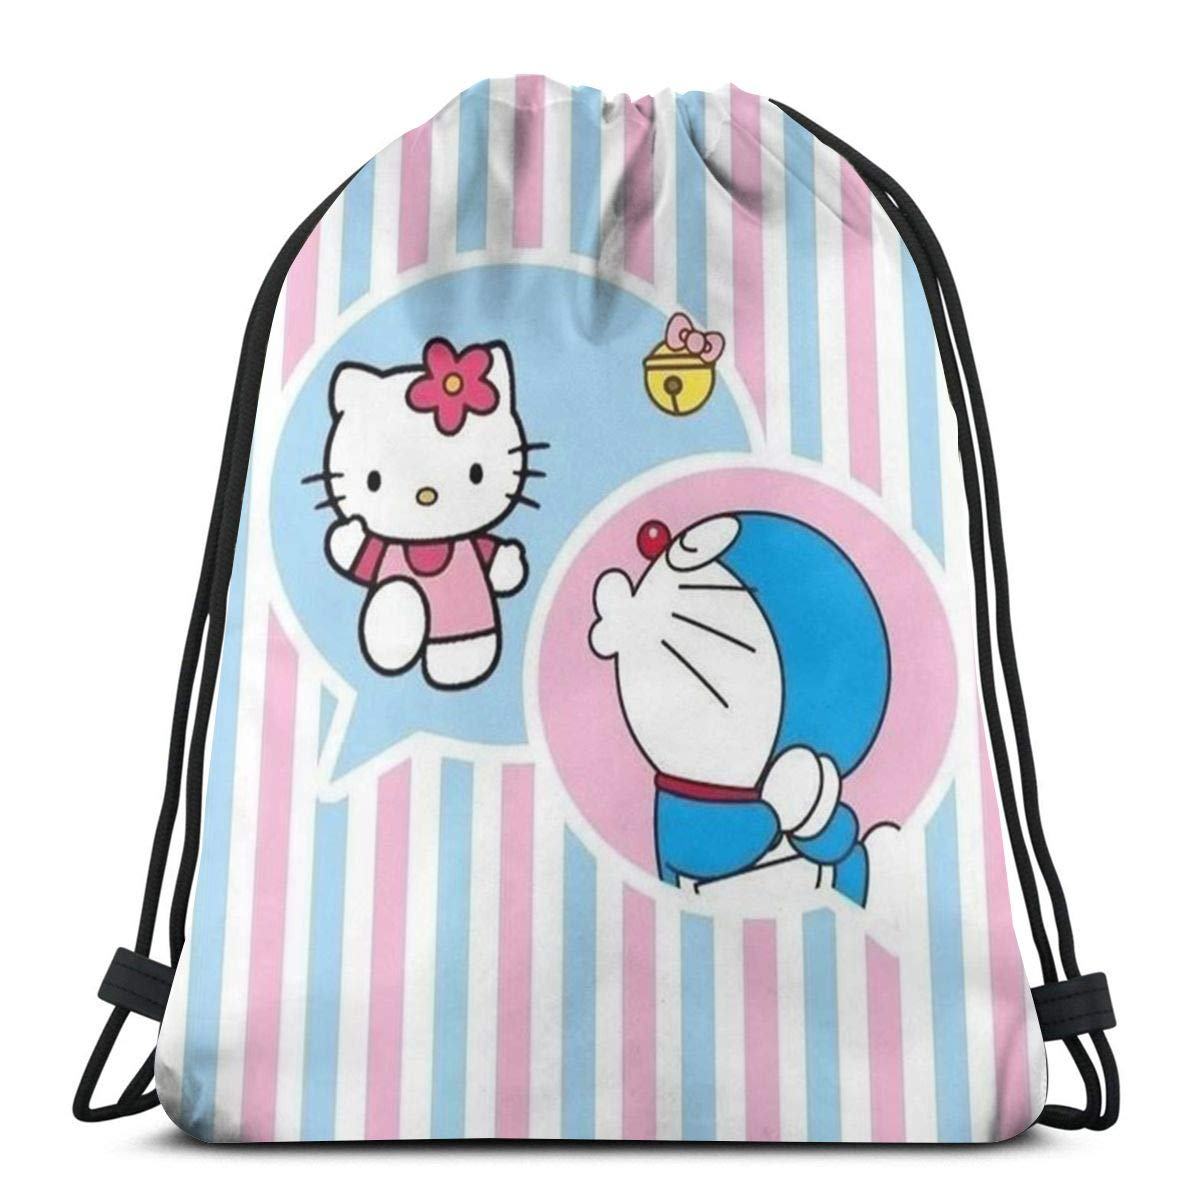 MPJTJGWZ クラシック巾着バッグ キティとドラえもんのジムバックパック ショルダーバッグ スポーツ収納バッグ 男女兼用 B07PXRR32V